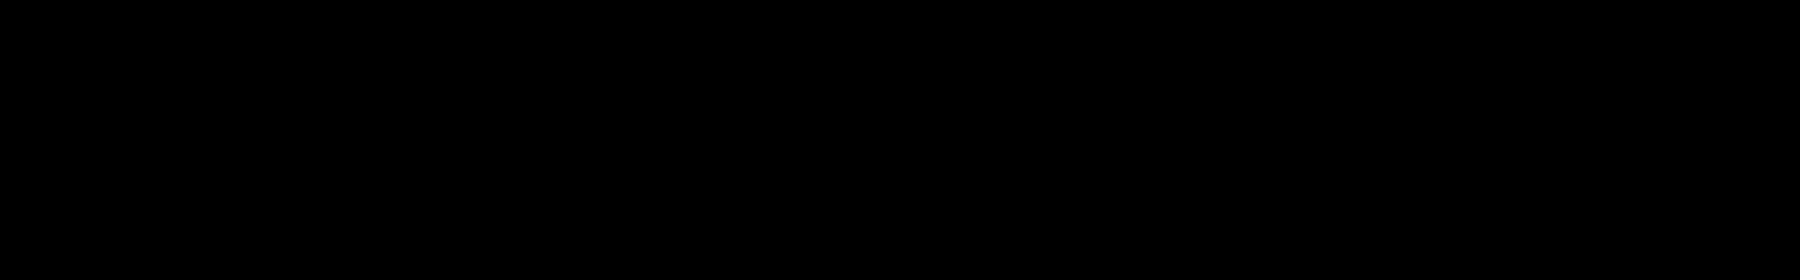 Baker's MIDI 2 audio waveform